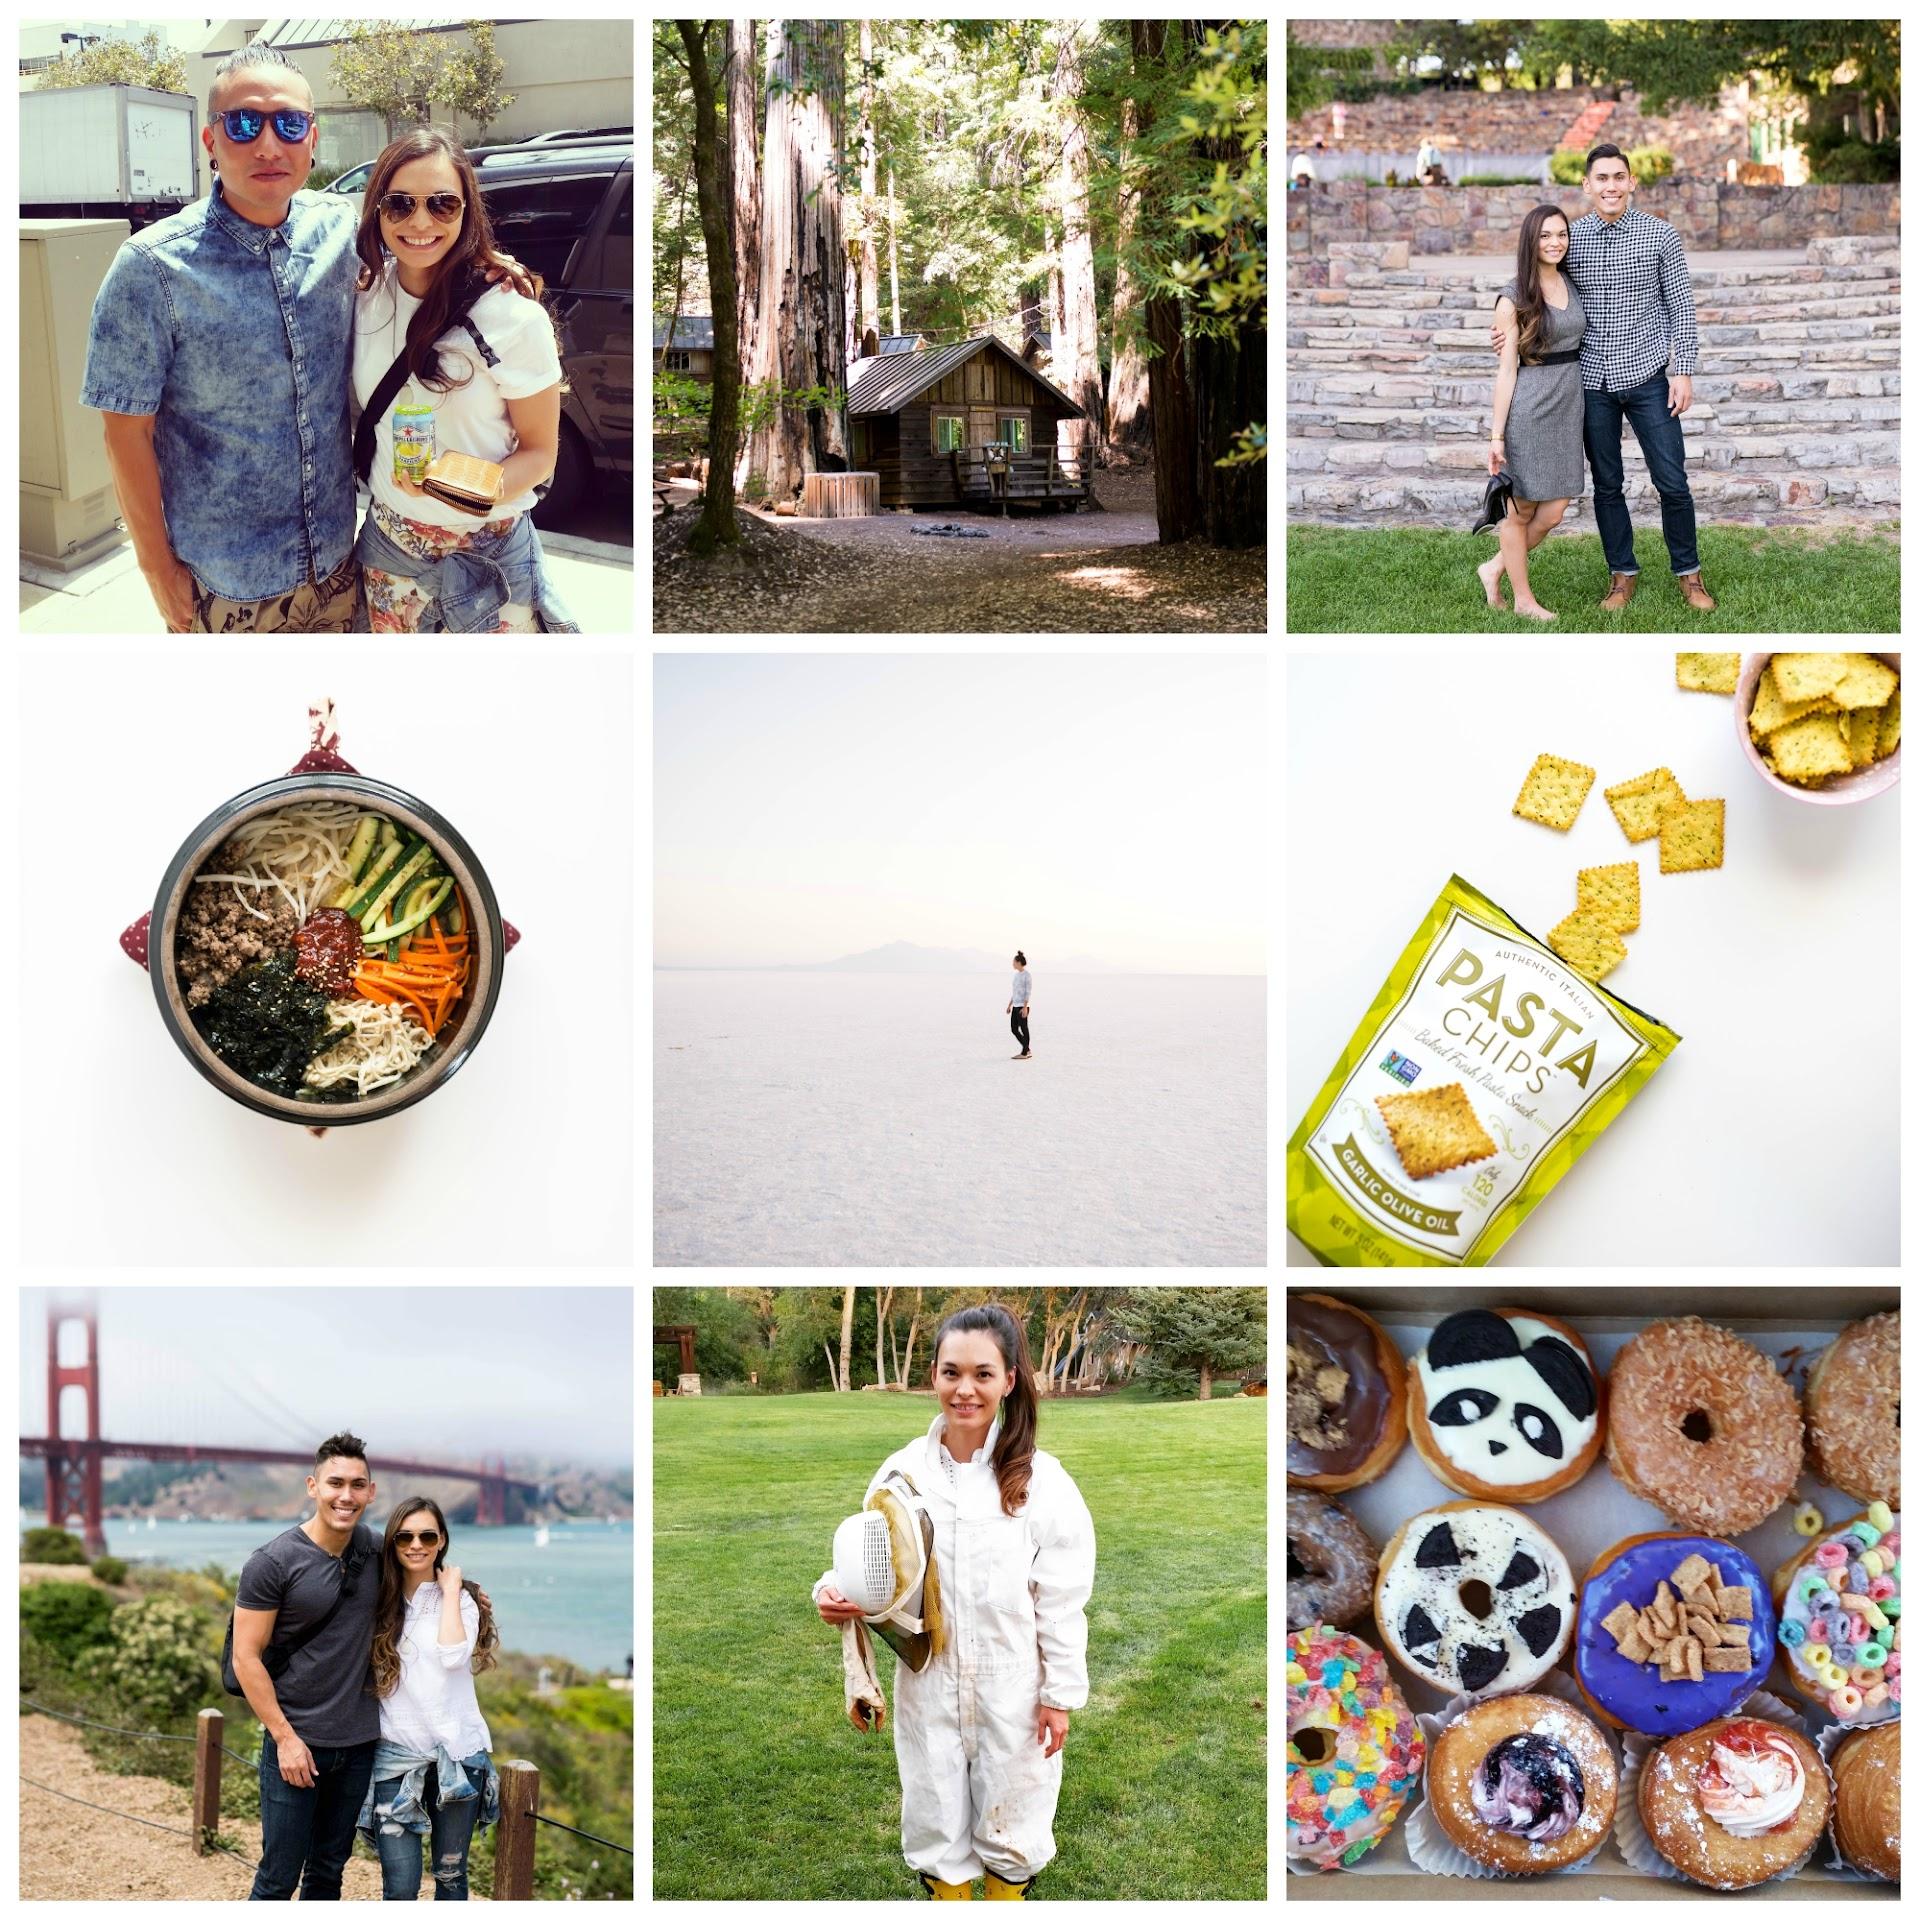 mormon, lds, california, LA, seoul sausage review, chris oh, california donuts, utah, american fork ampitheater, stone bowl bibimbap, salt flats photography, pasta chips review, redwoods camping